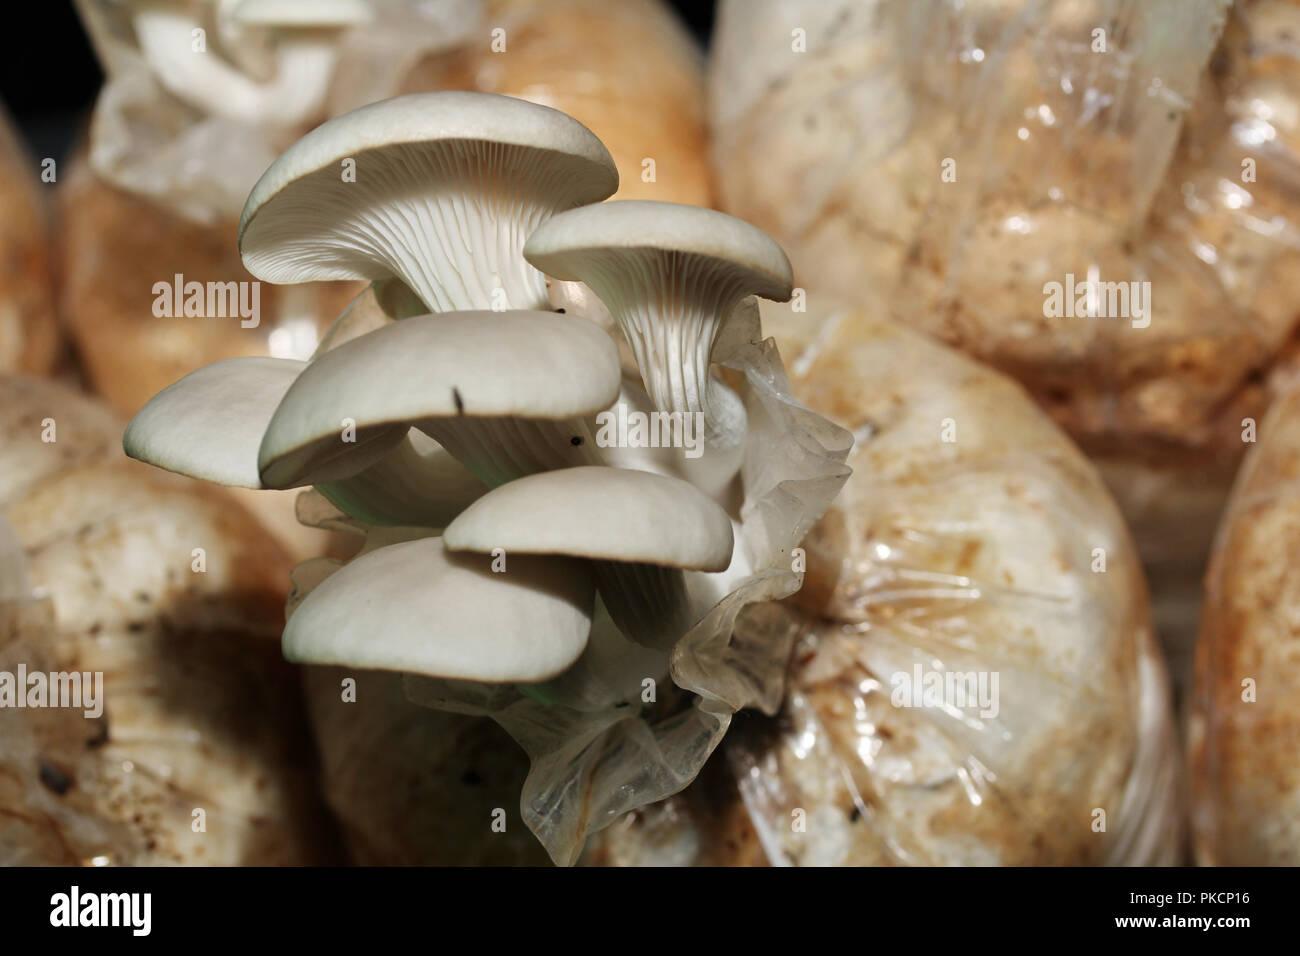 Oyster Mushroom Spawn Stock Photos & Oyster Mushroom Spawn Stock